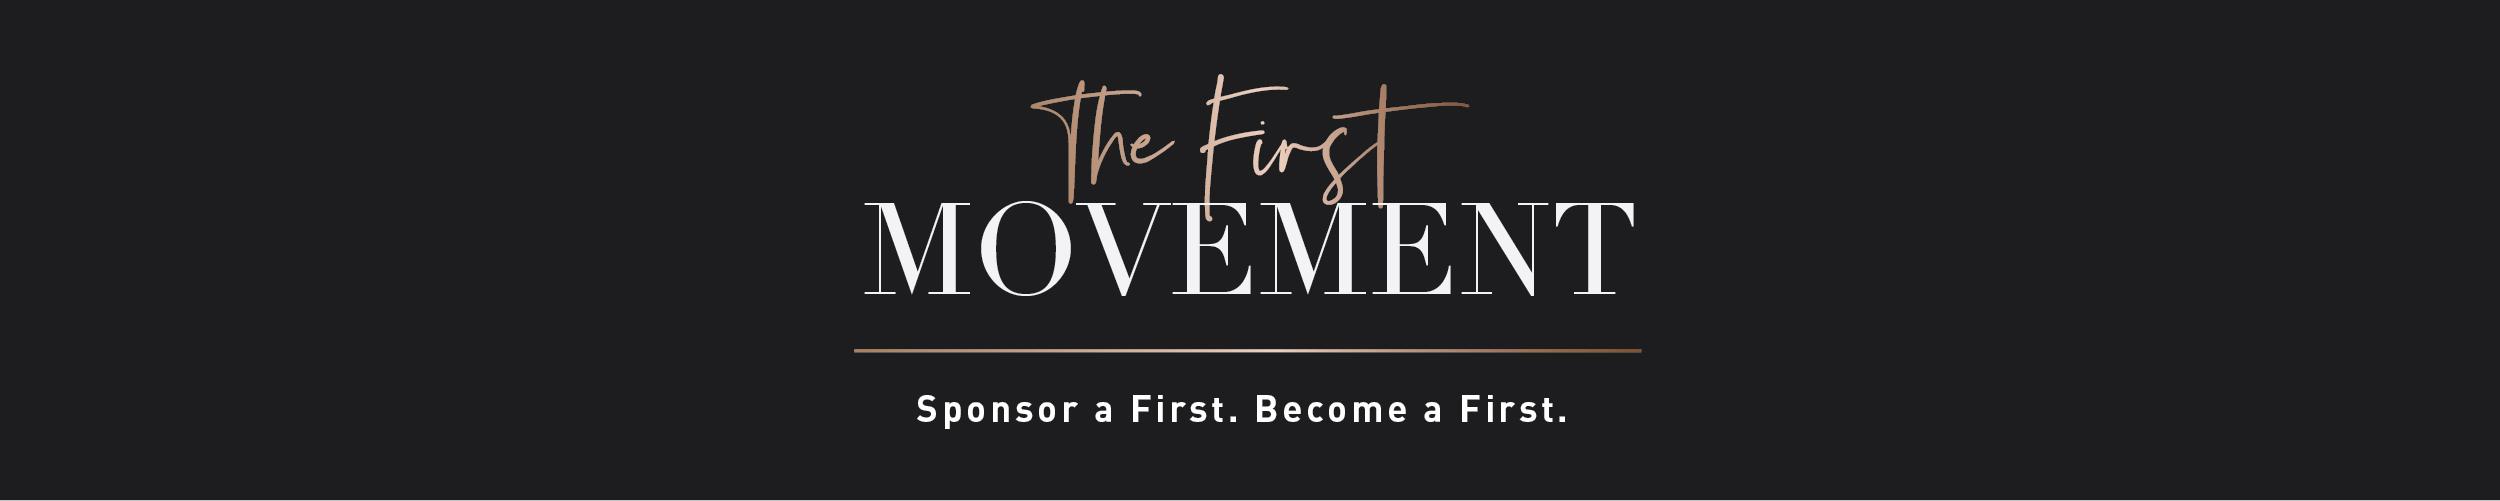 The First Movement-01-black.jpg